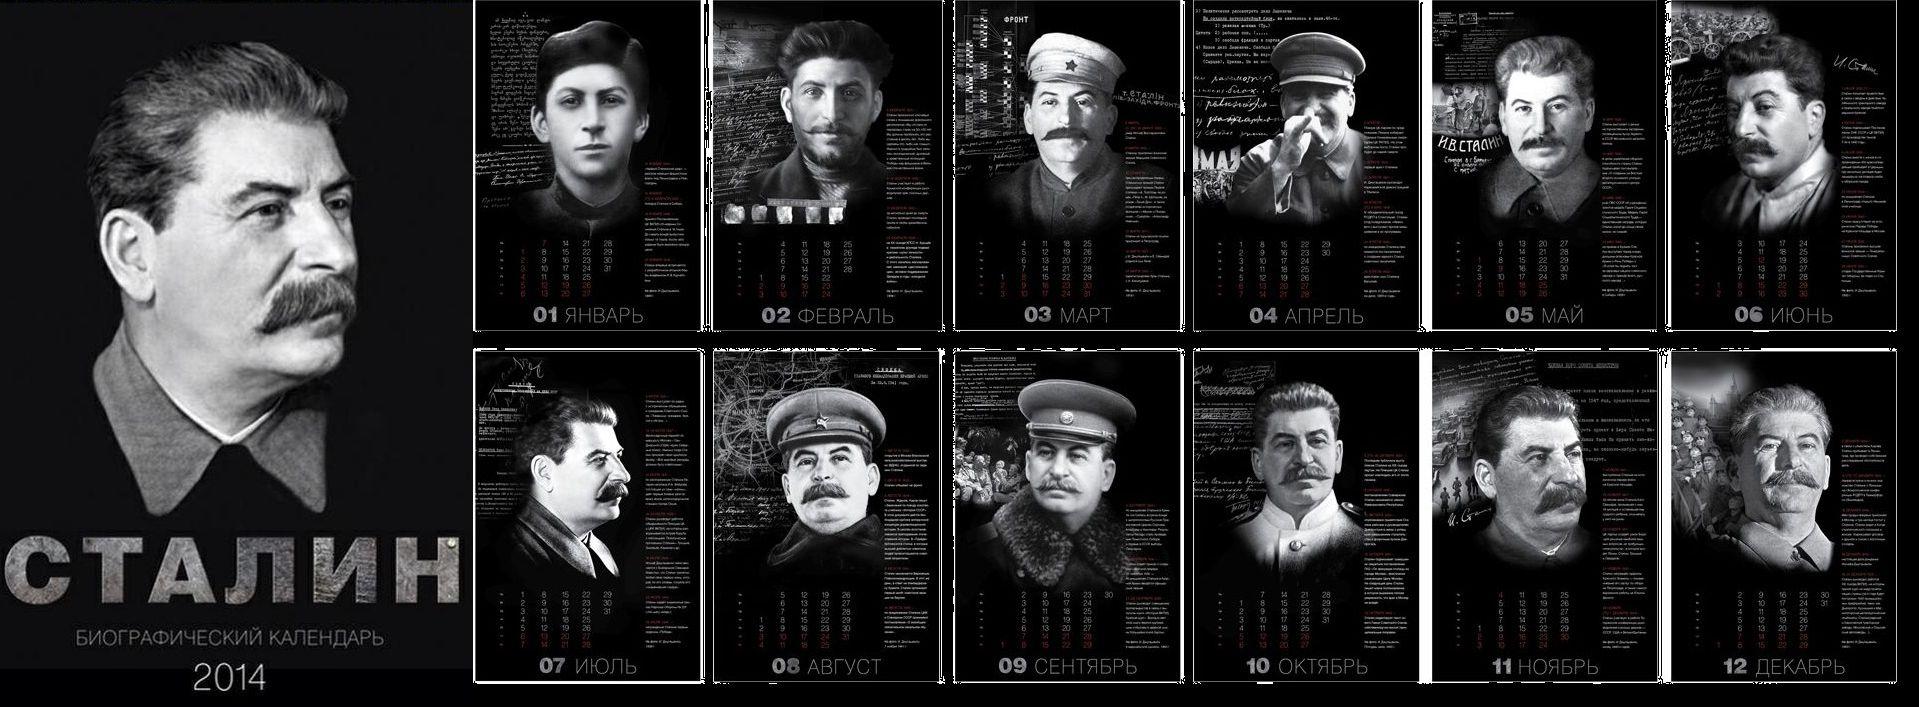 РПЦ_календарь_на_2014_г_Сталин